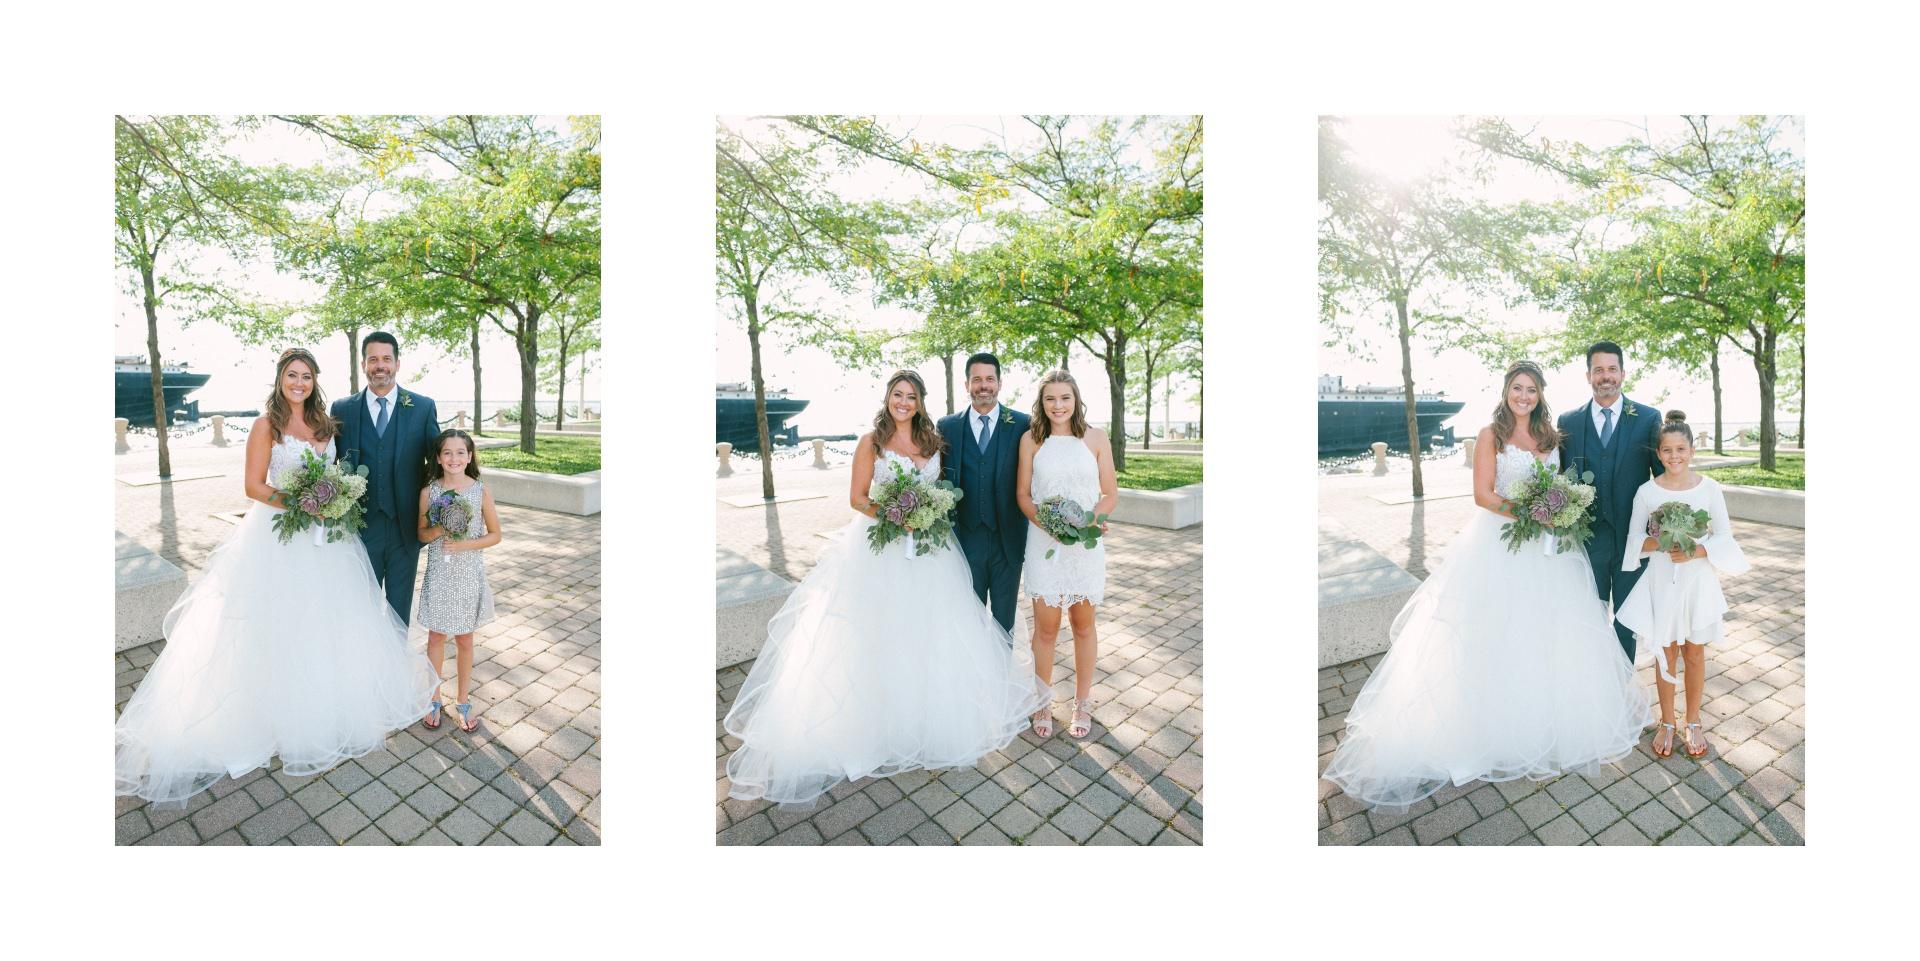 Nuevo Modern Mexican Wedding Photographer in Cleveland 1 34.jpg